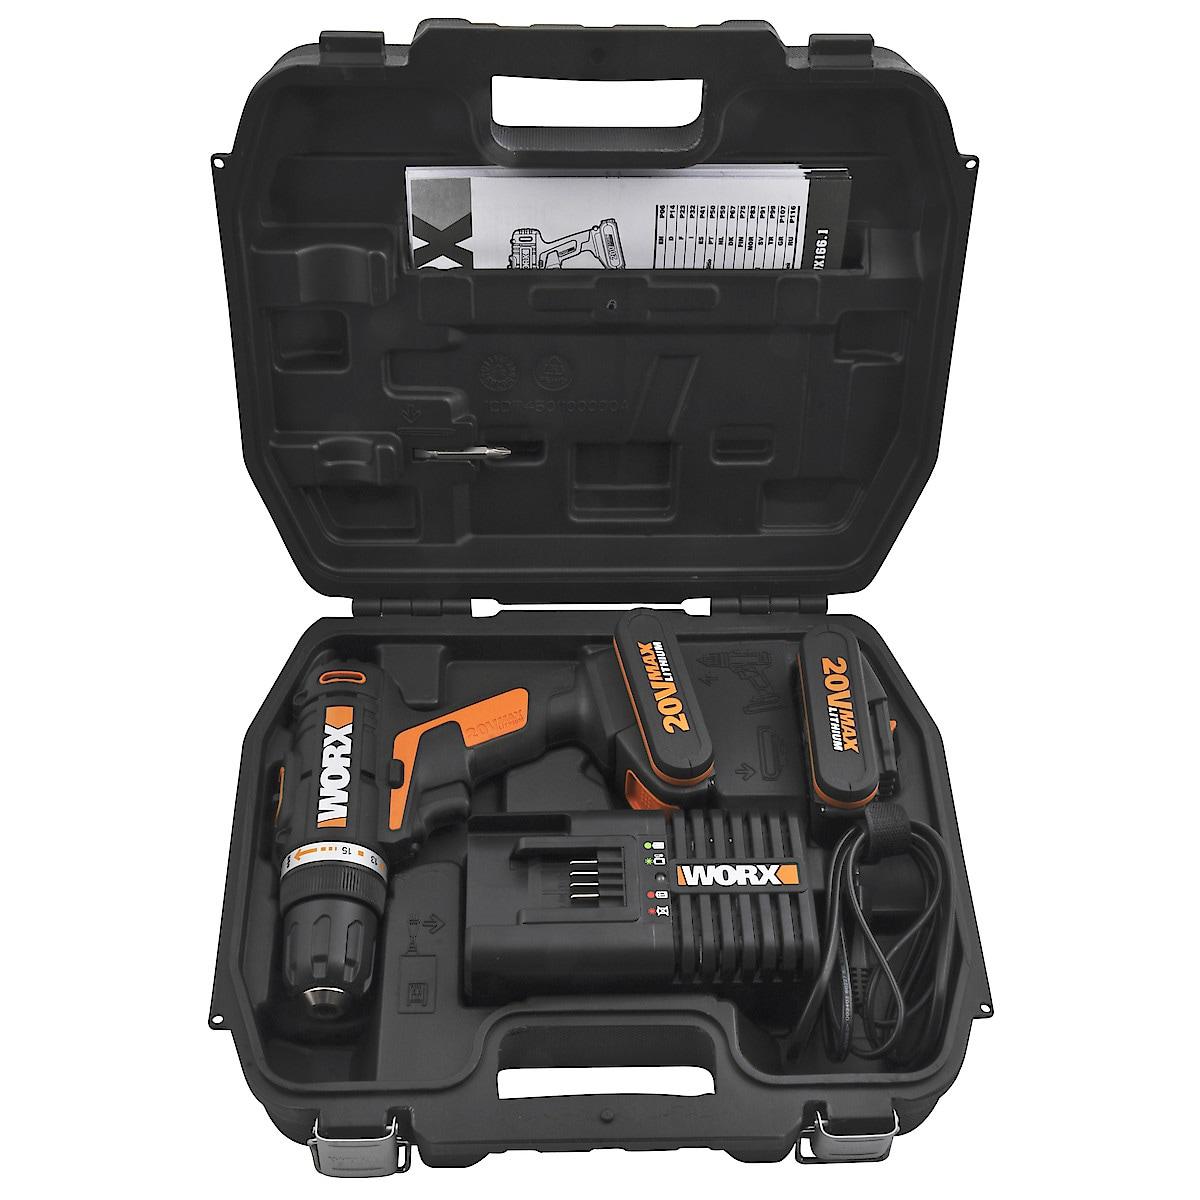 Worx WX166.3 drill